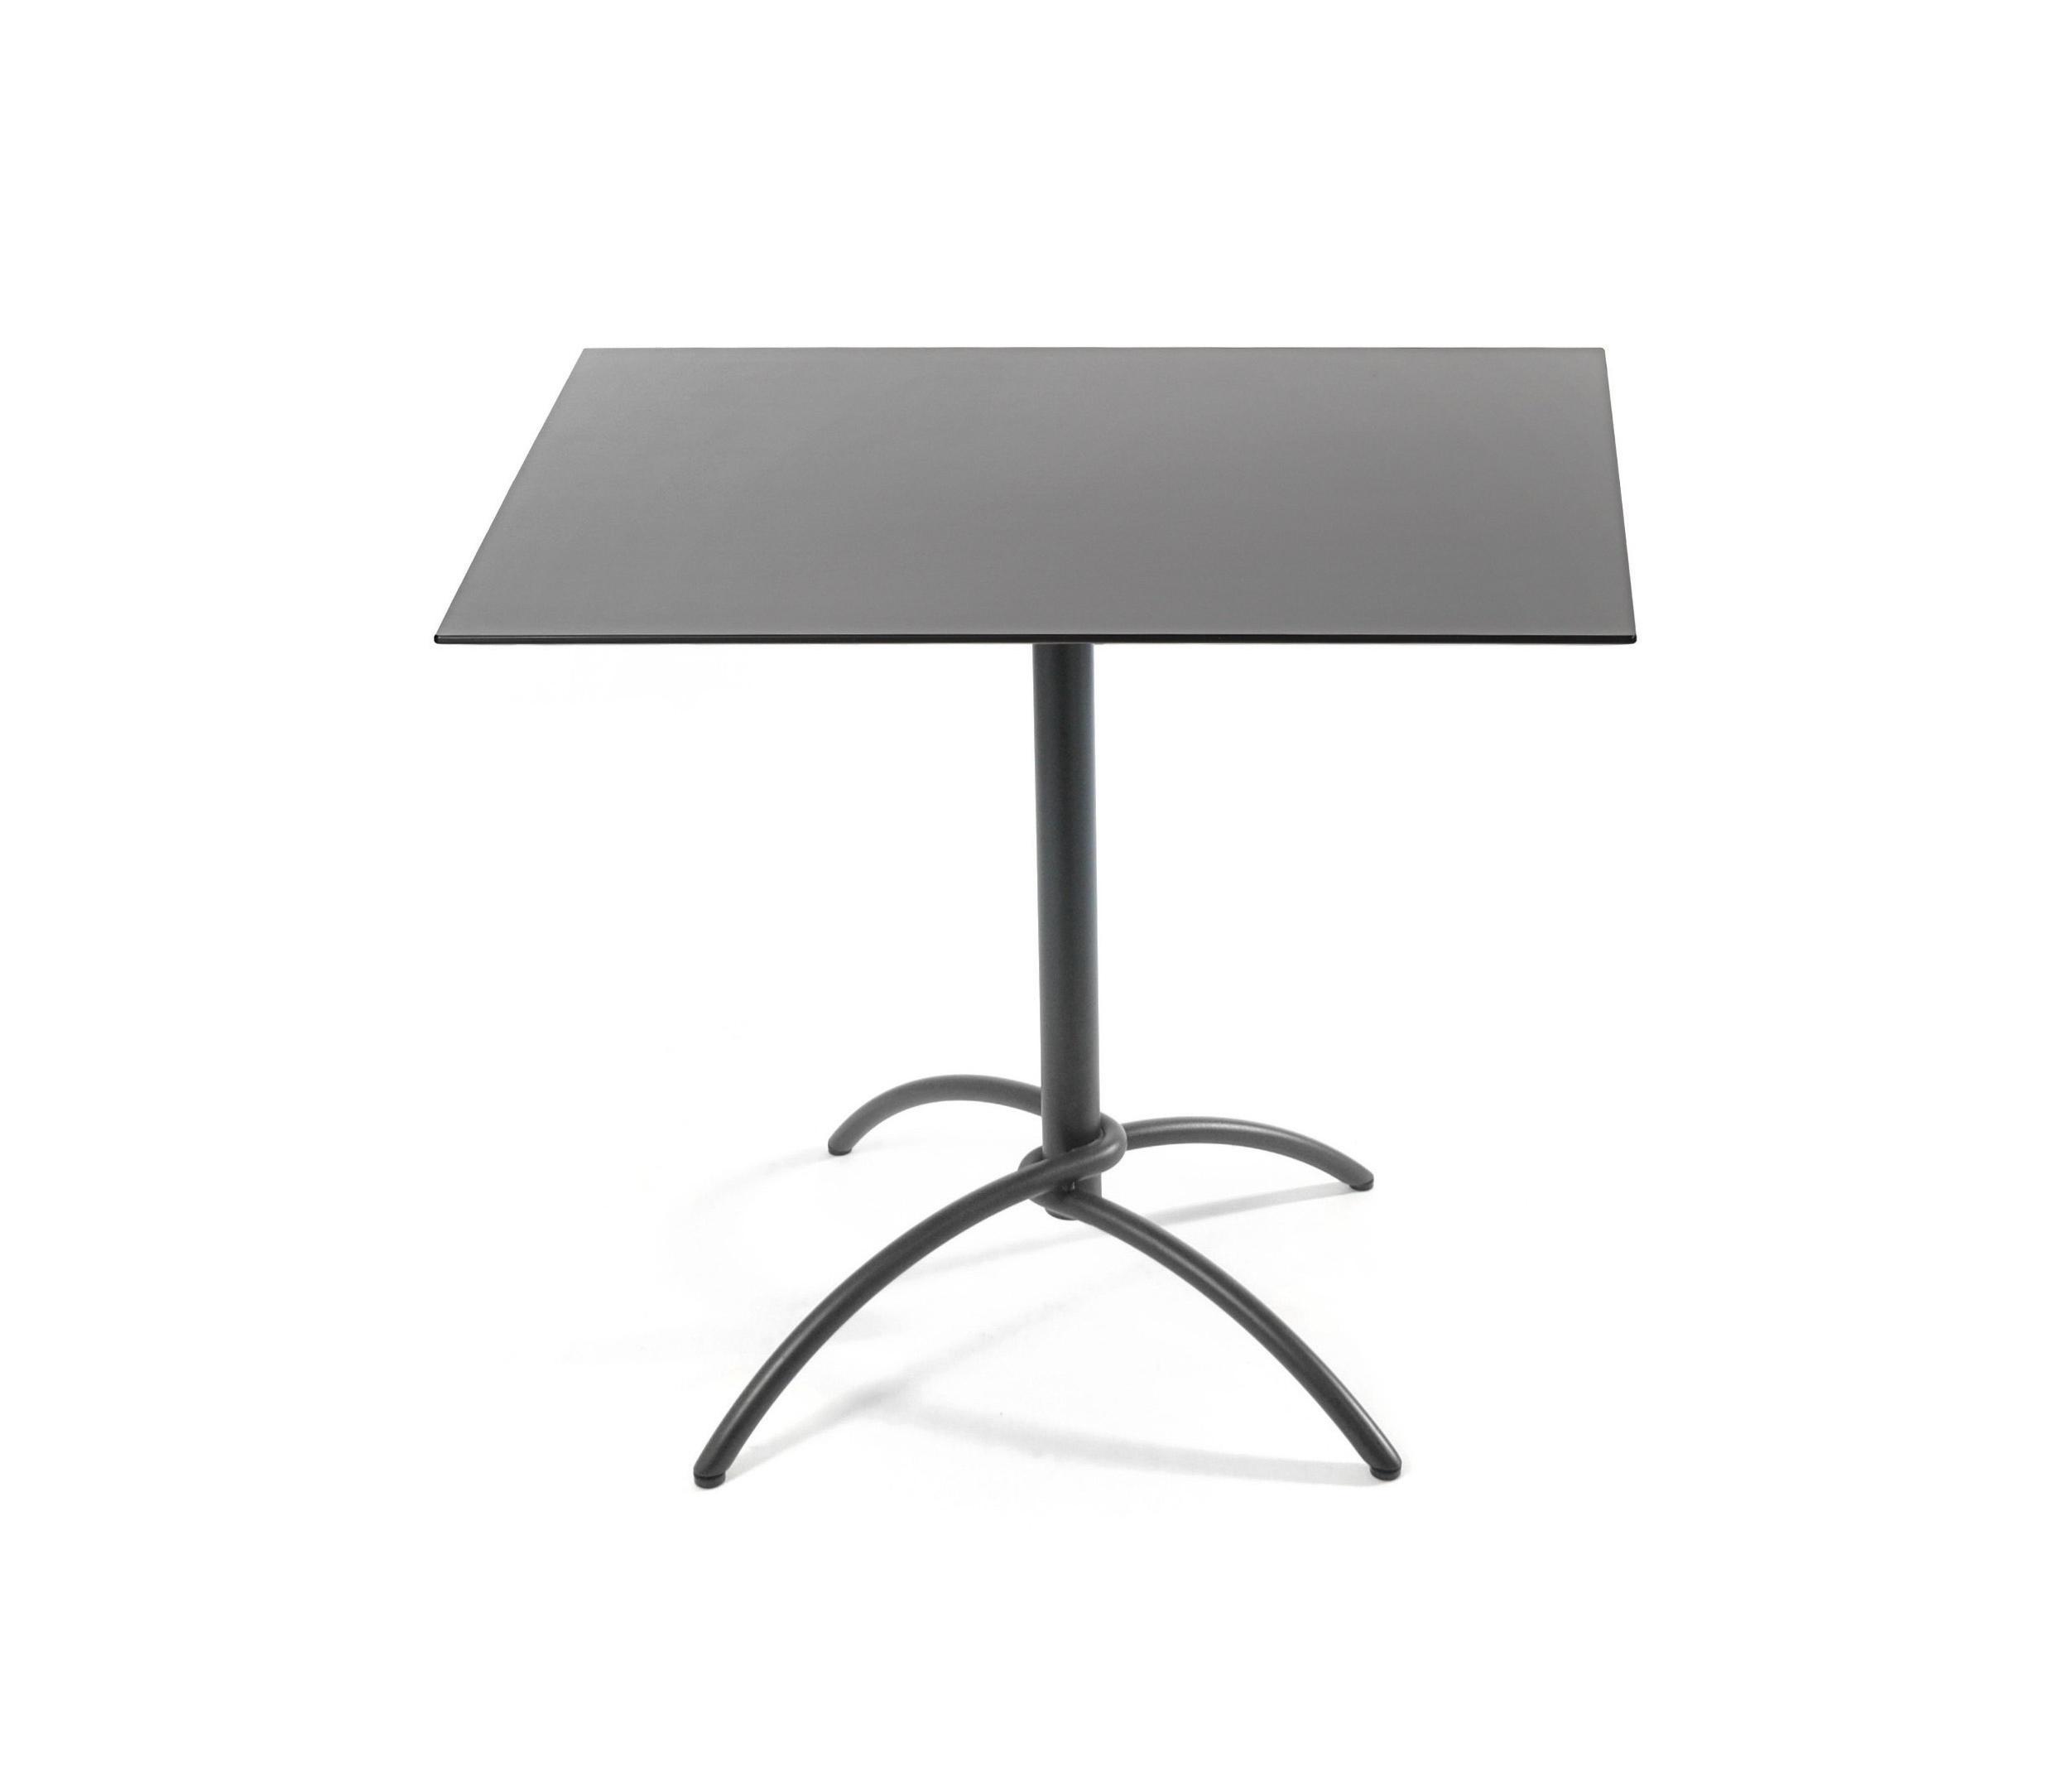 Taku bistro table bistro tables from fischer m bel for Mobel fischer